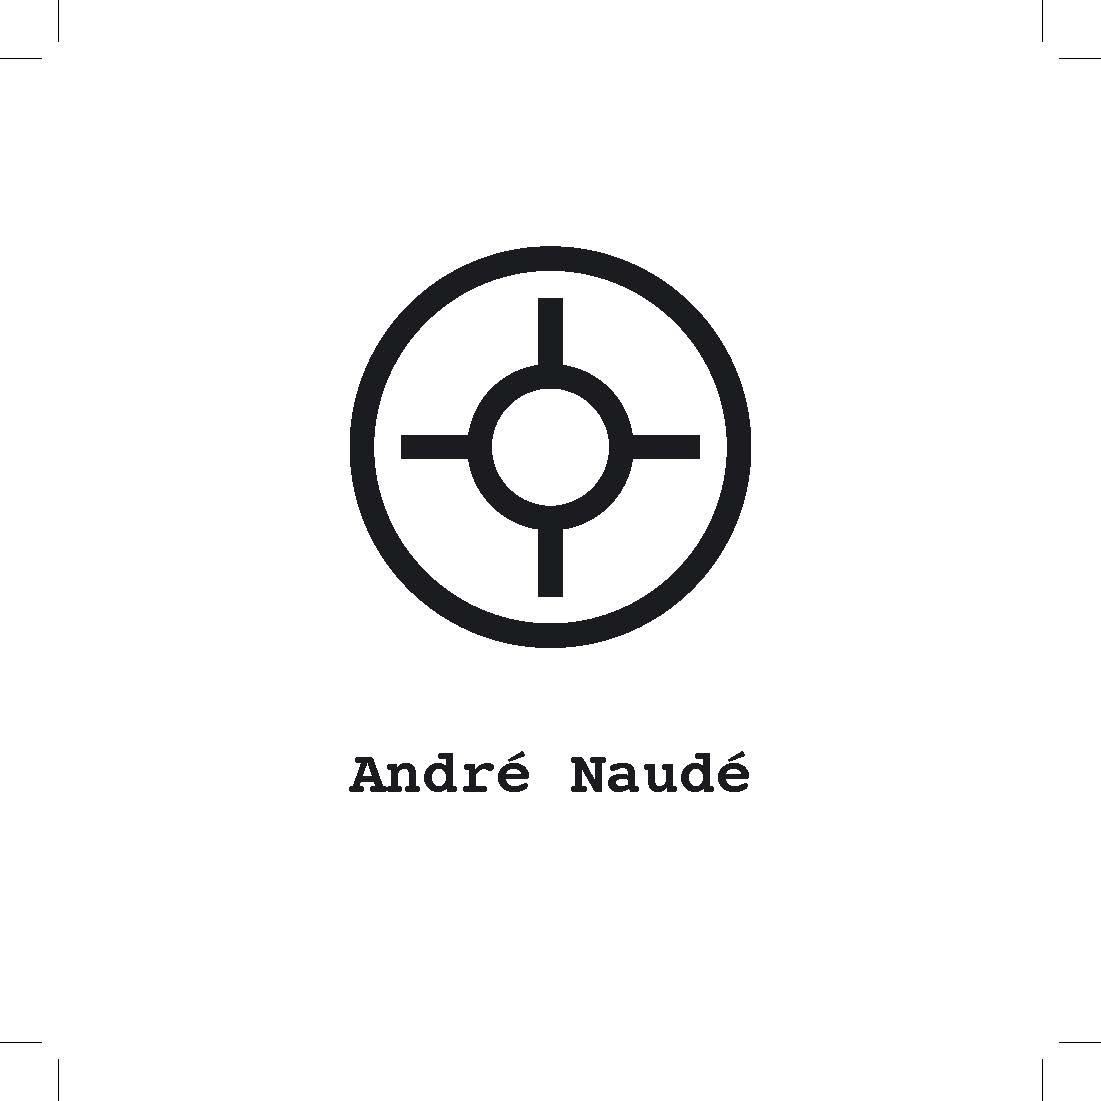 MAP Southafrica - André Naudé